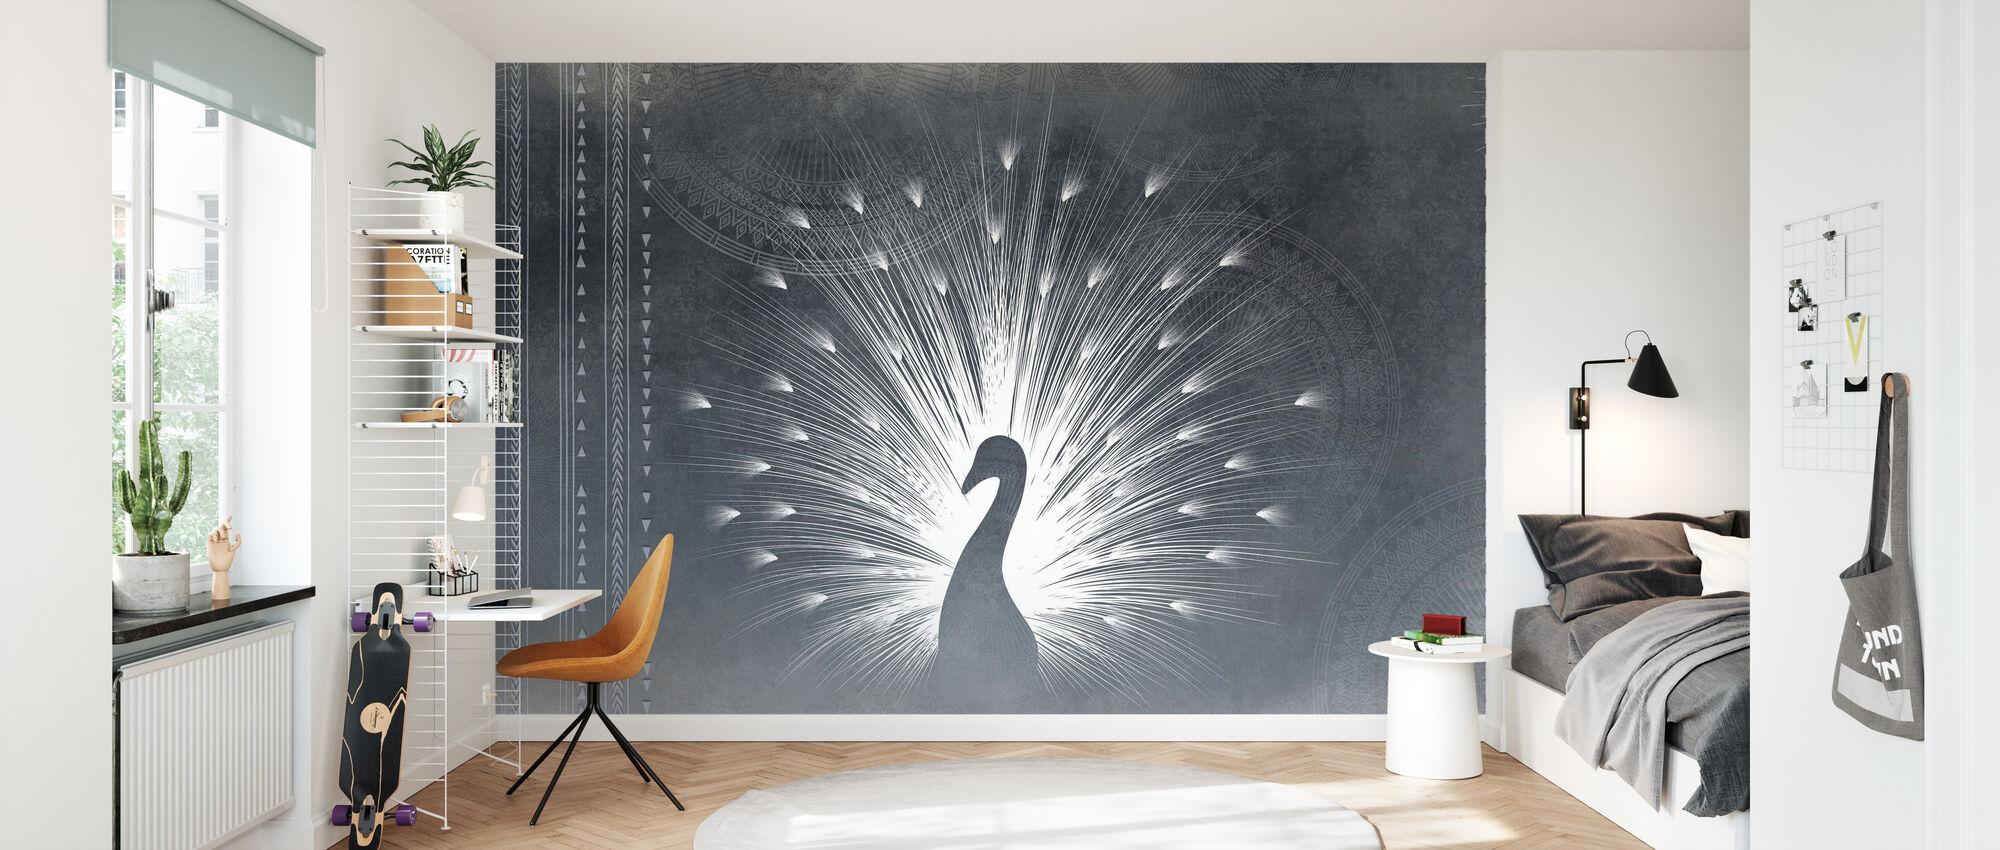 Peacock Deco - Wallpaper - Kids Room